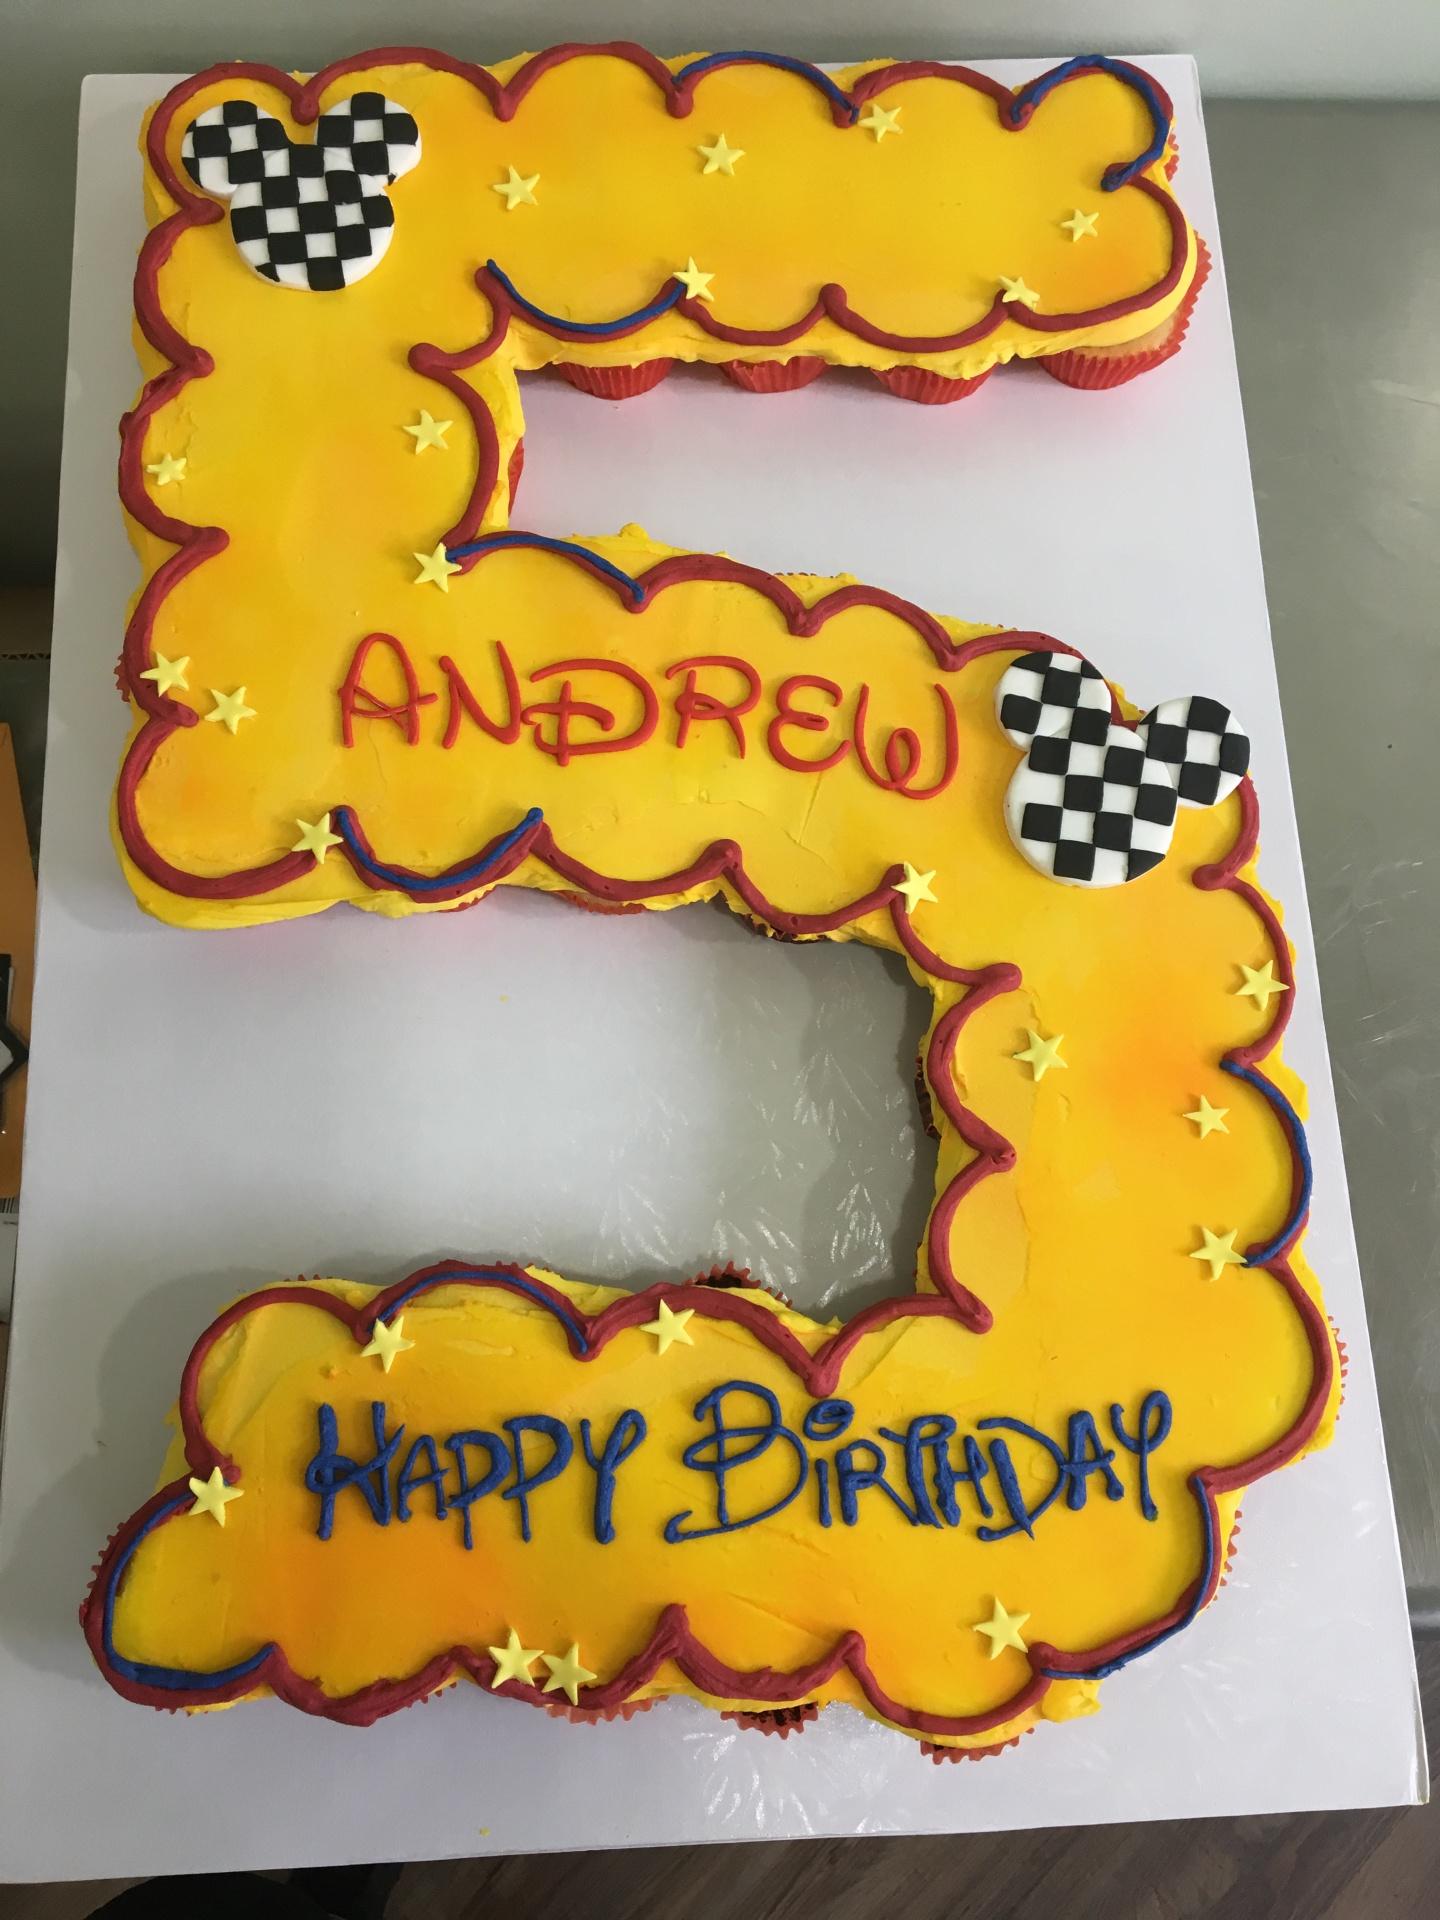 Custom Cakes NJ Cupcake Cake in the number 5